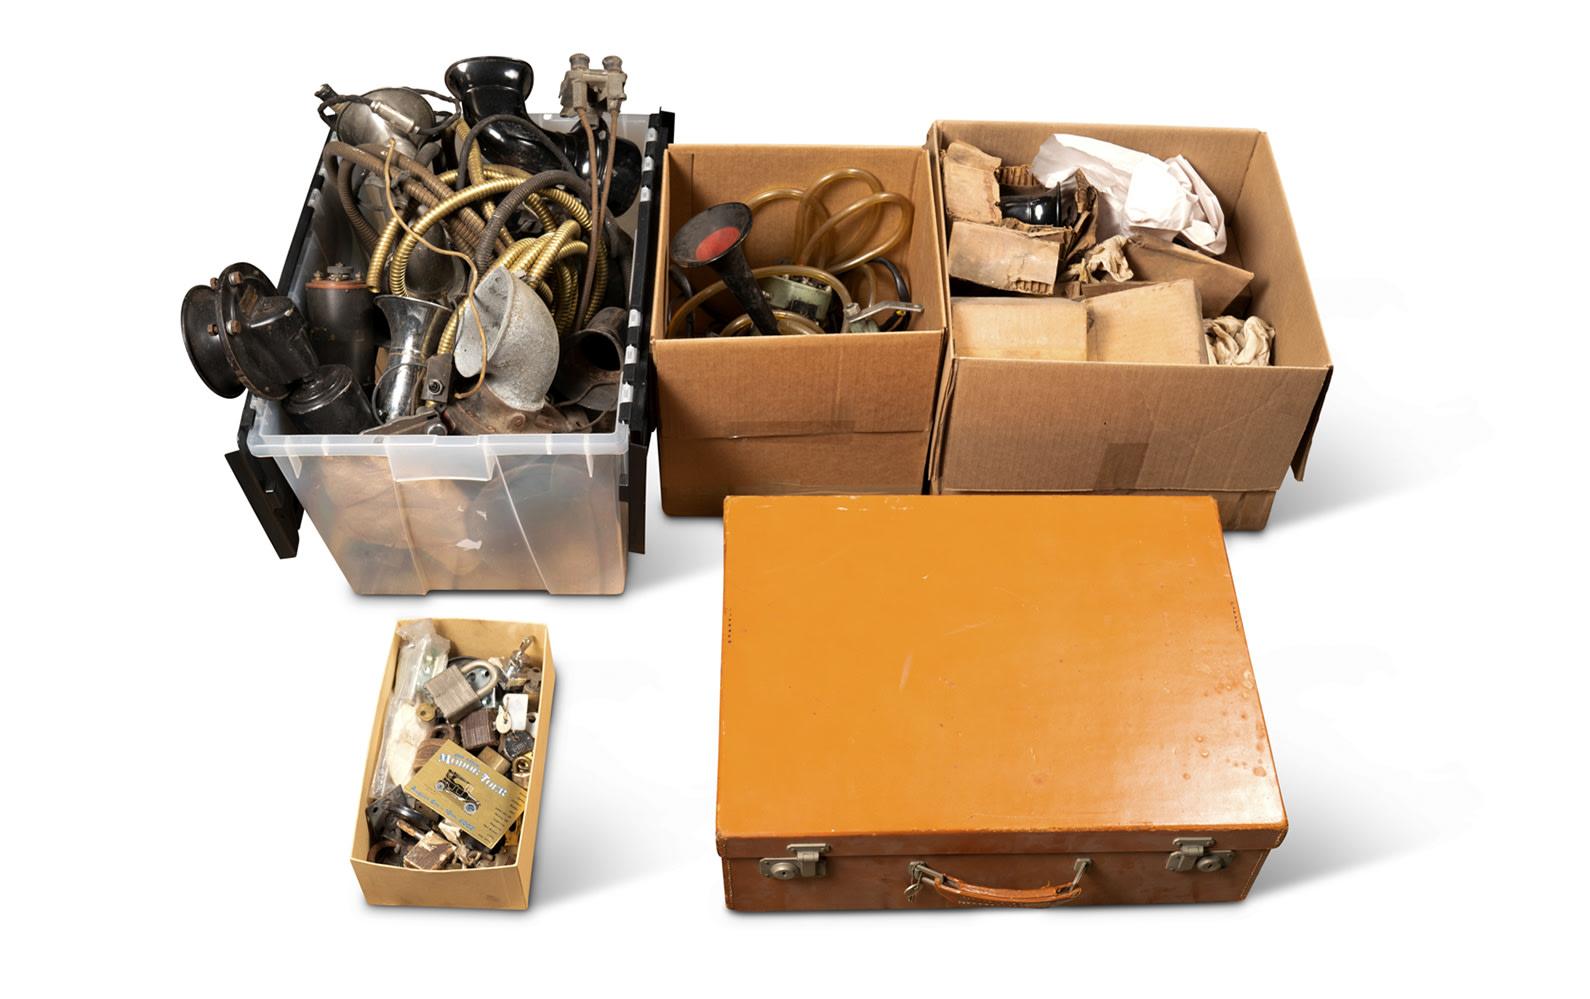 Prod/O21E - Phil Hill C 2021/C0182_Horns, Radios, Padlocks and Grooming Case/C0182_Horns_Radios_Padlocks_Grooming_Case_3_xss7p2